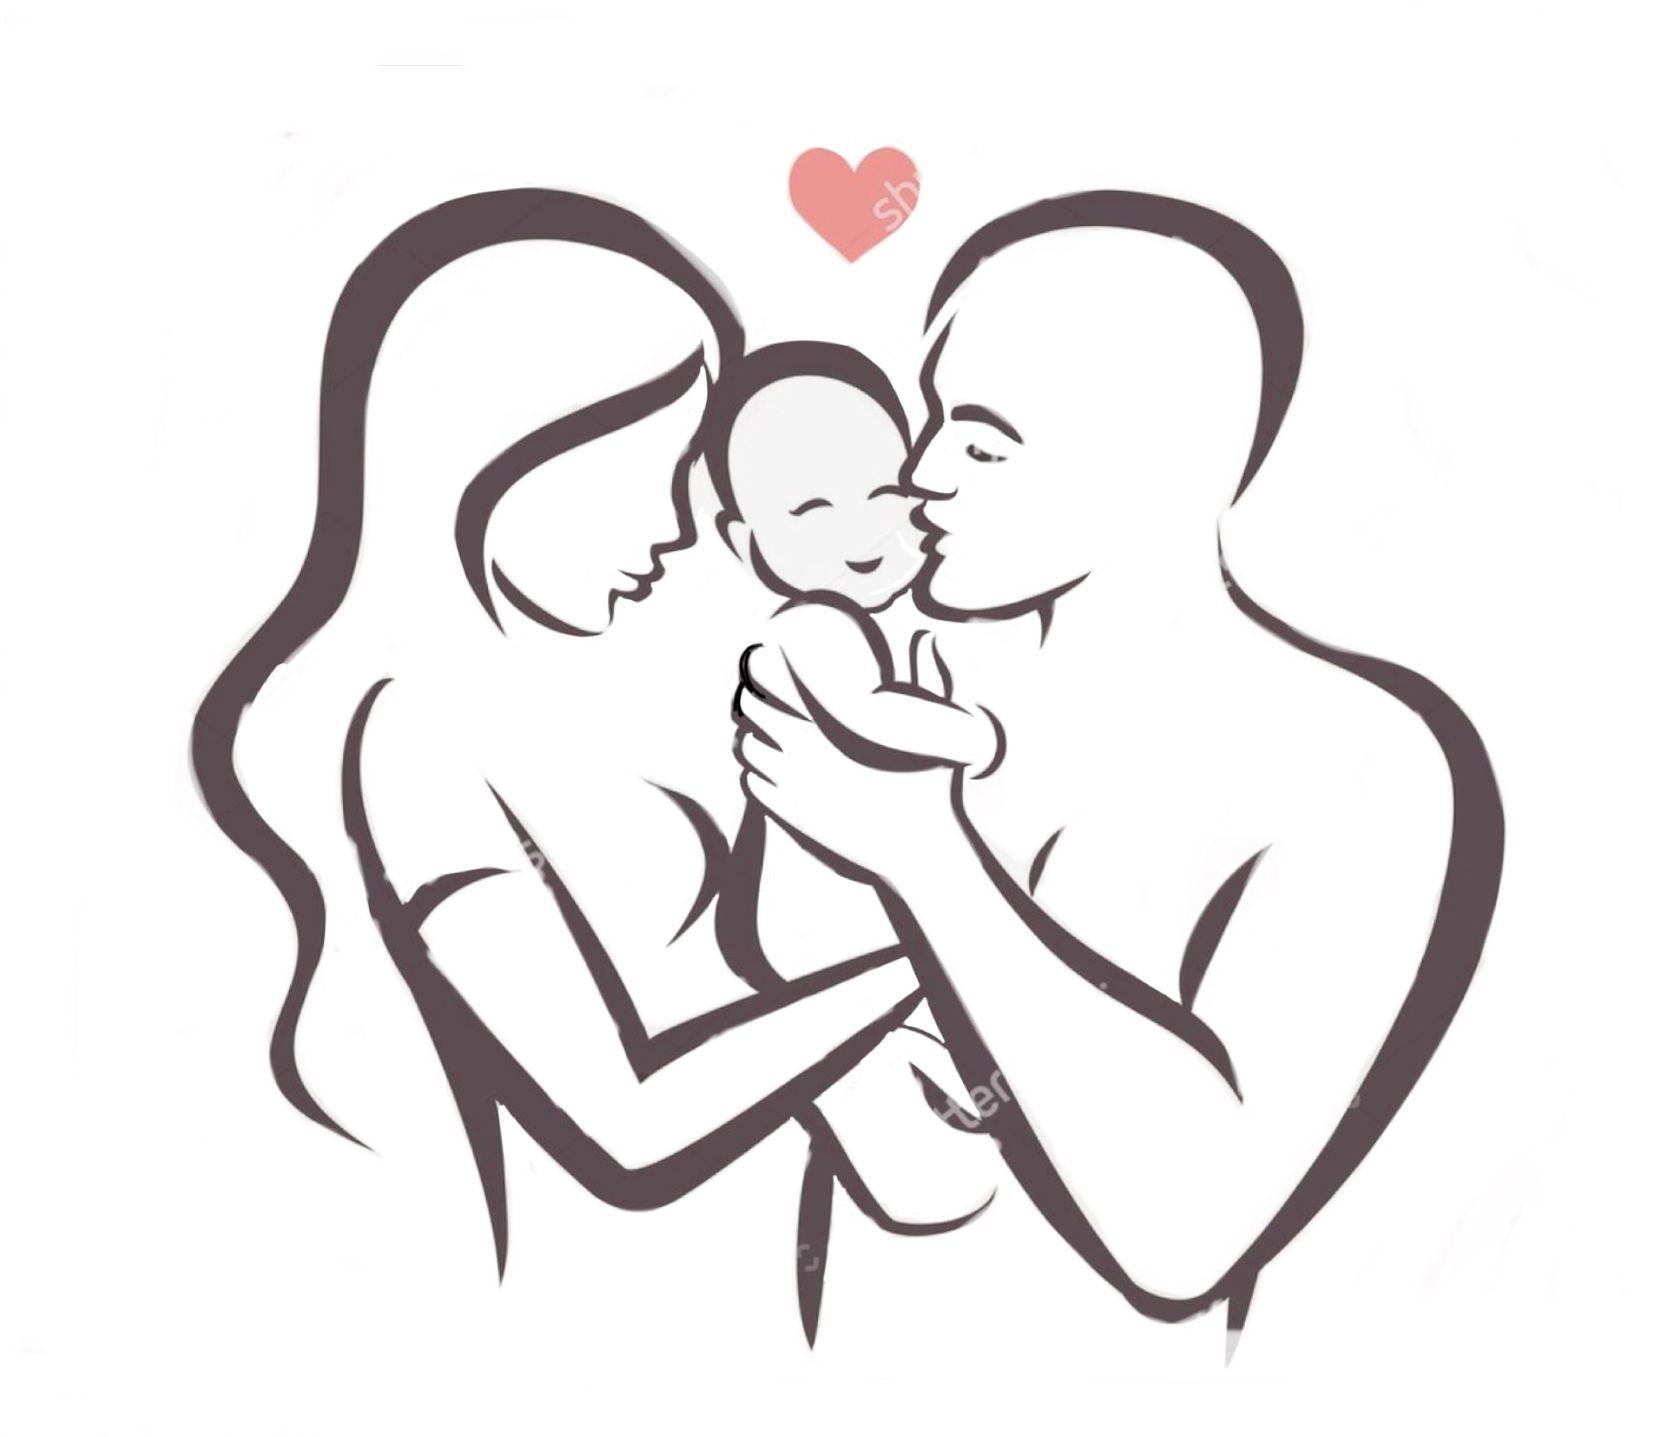 Baby Ausmalbilder Ausmalen Coloring Coloringpagesforkids 0